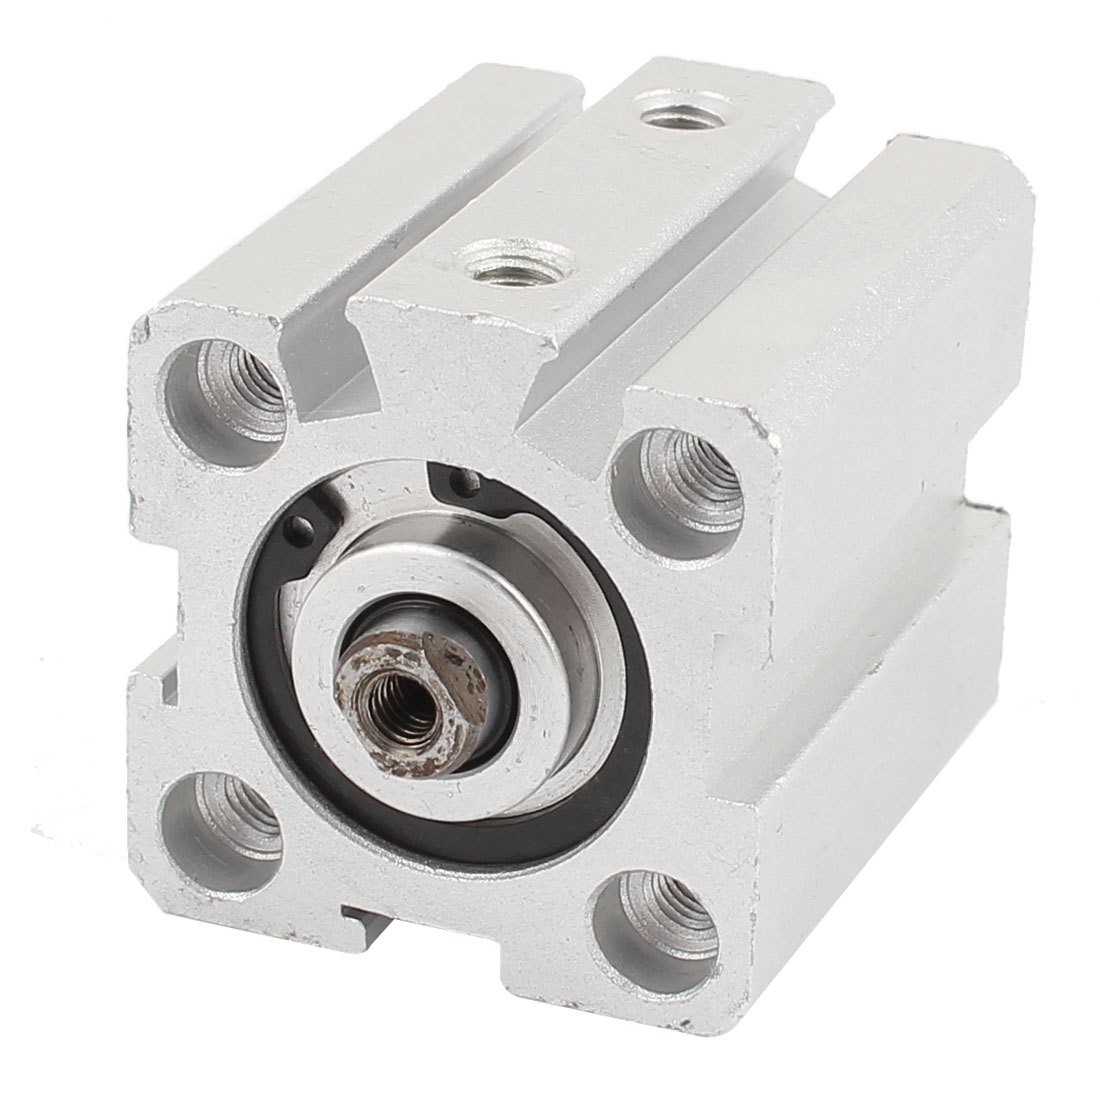 KSDA20x20 20mm Stroke 20mm Bore Aluminium Pneumatic Compact Air Cylinder